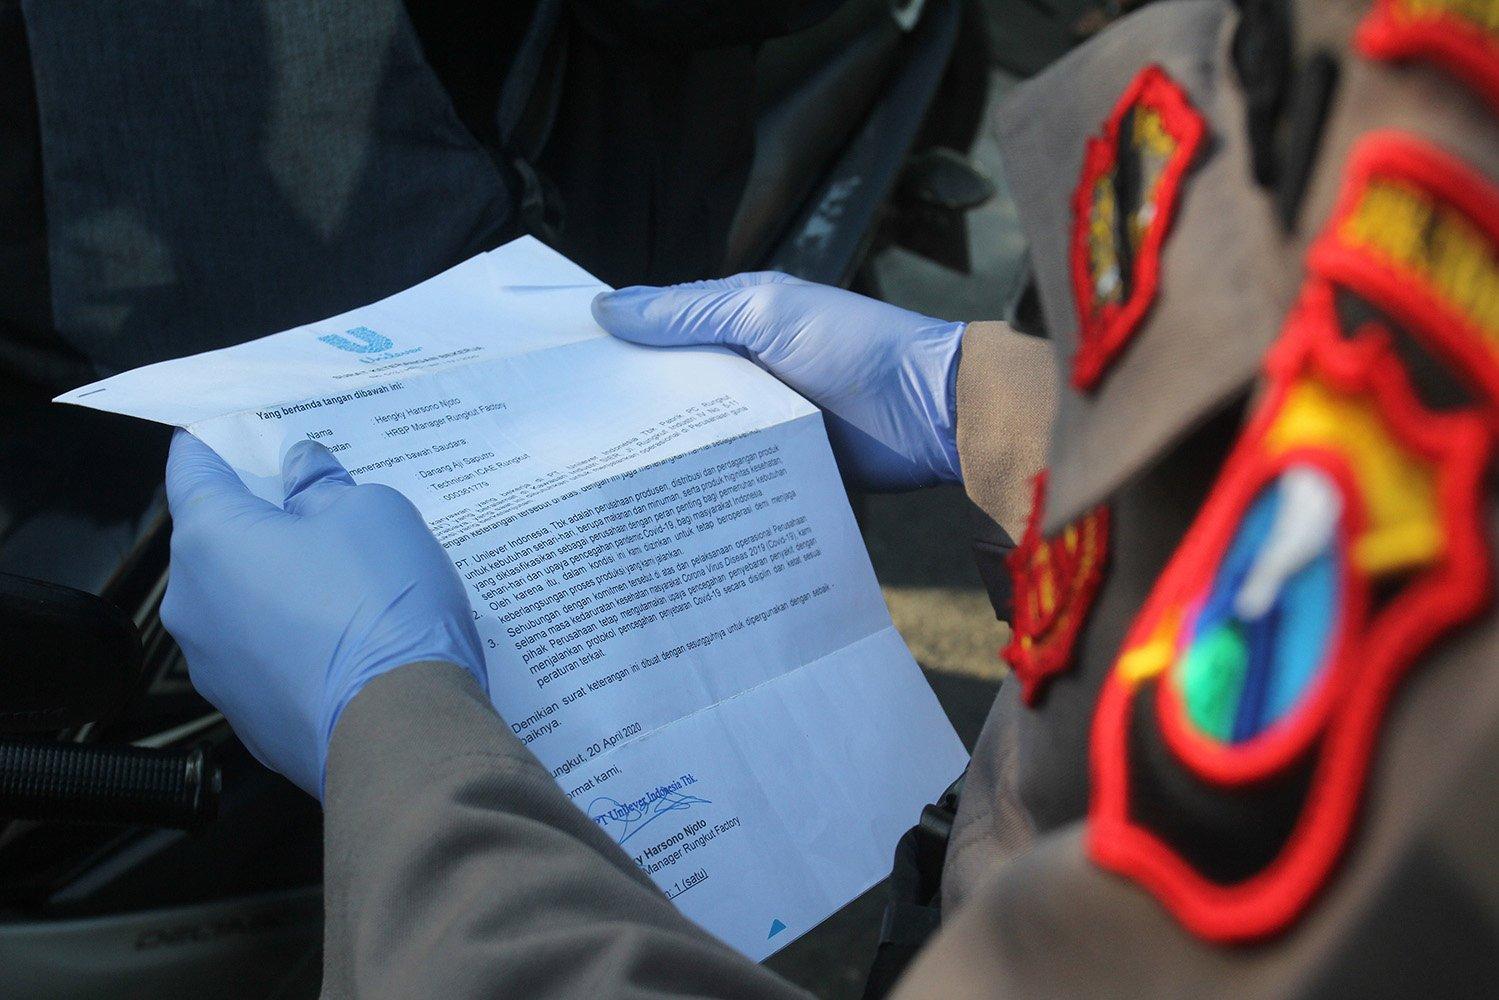 Polisi memeriksa dokumen perjalanan warga saat melakukan penyekatan Pembatasan Sosial Berskala Besar (PSBB) di Bundaran Waru, Surabaya, Jawa Timur.